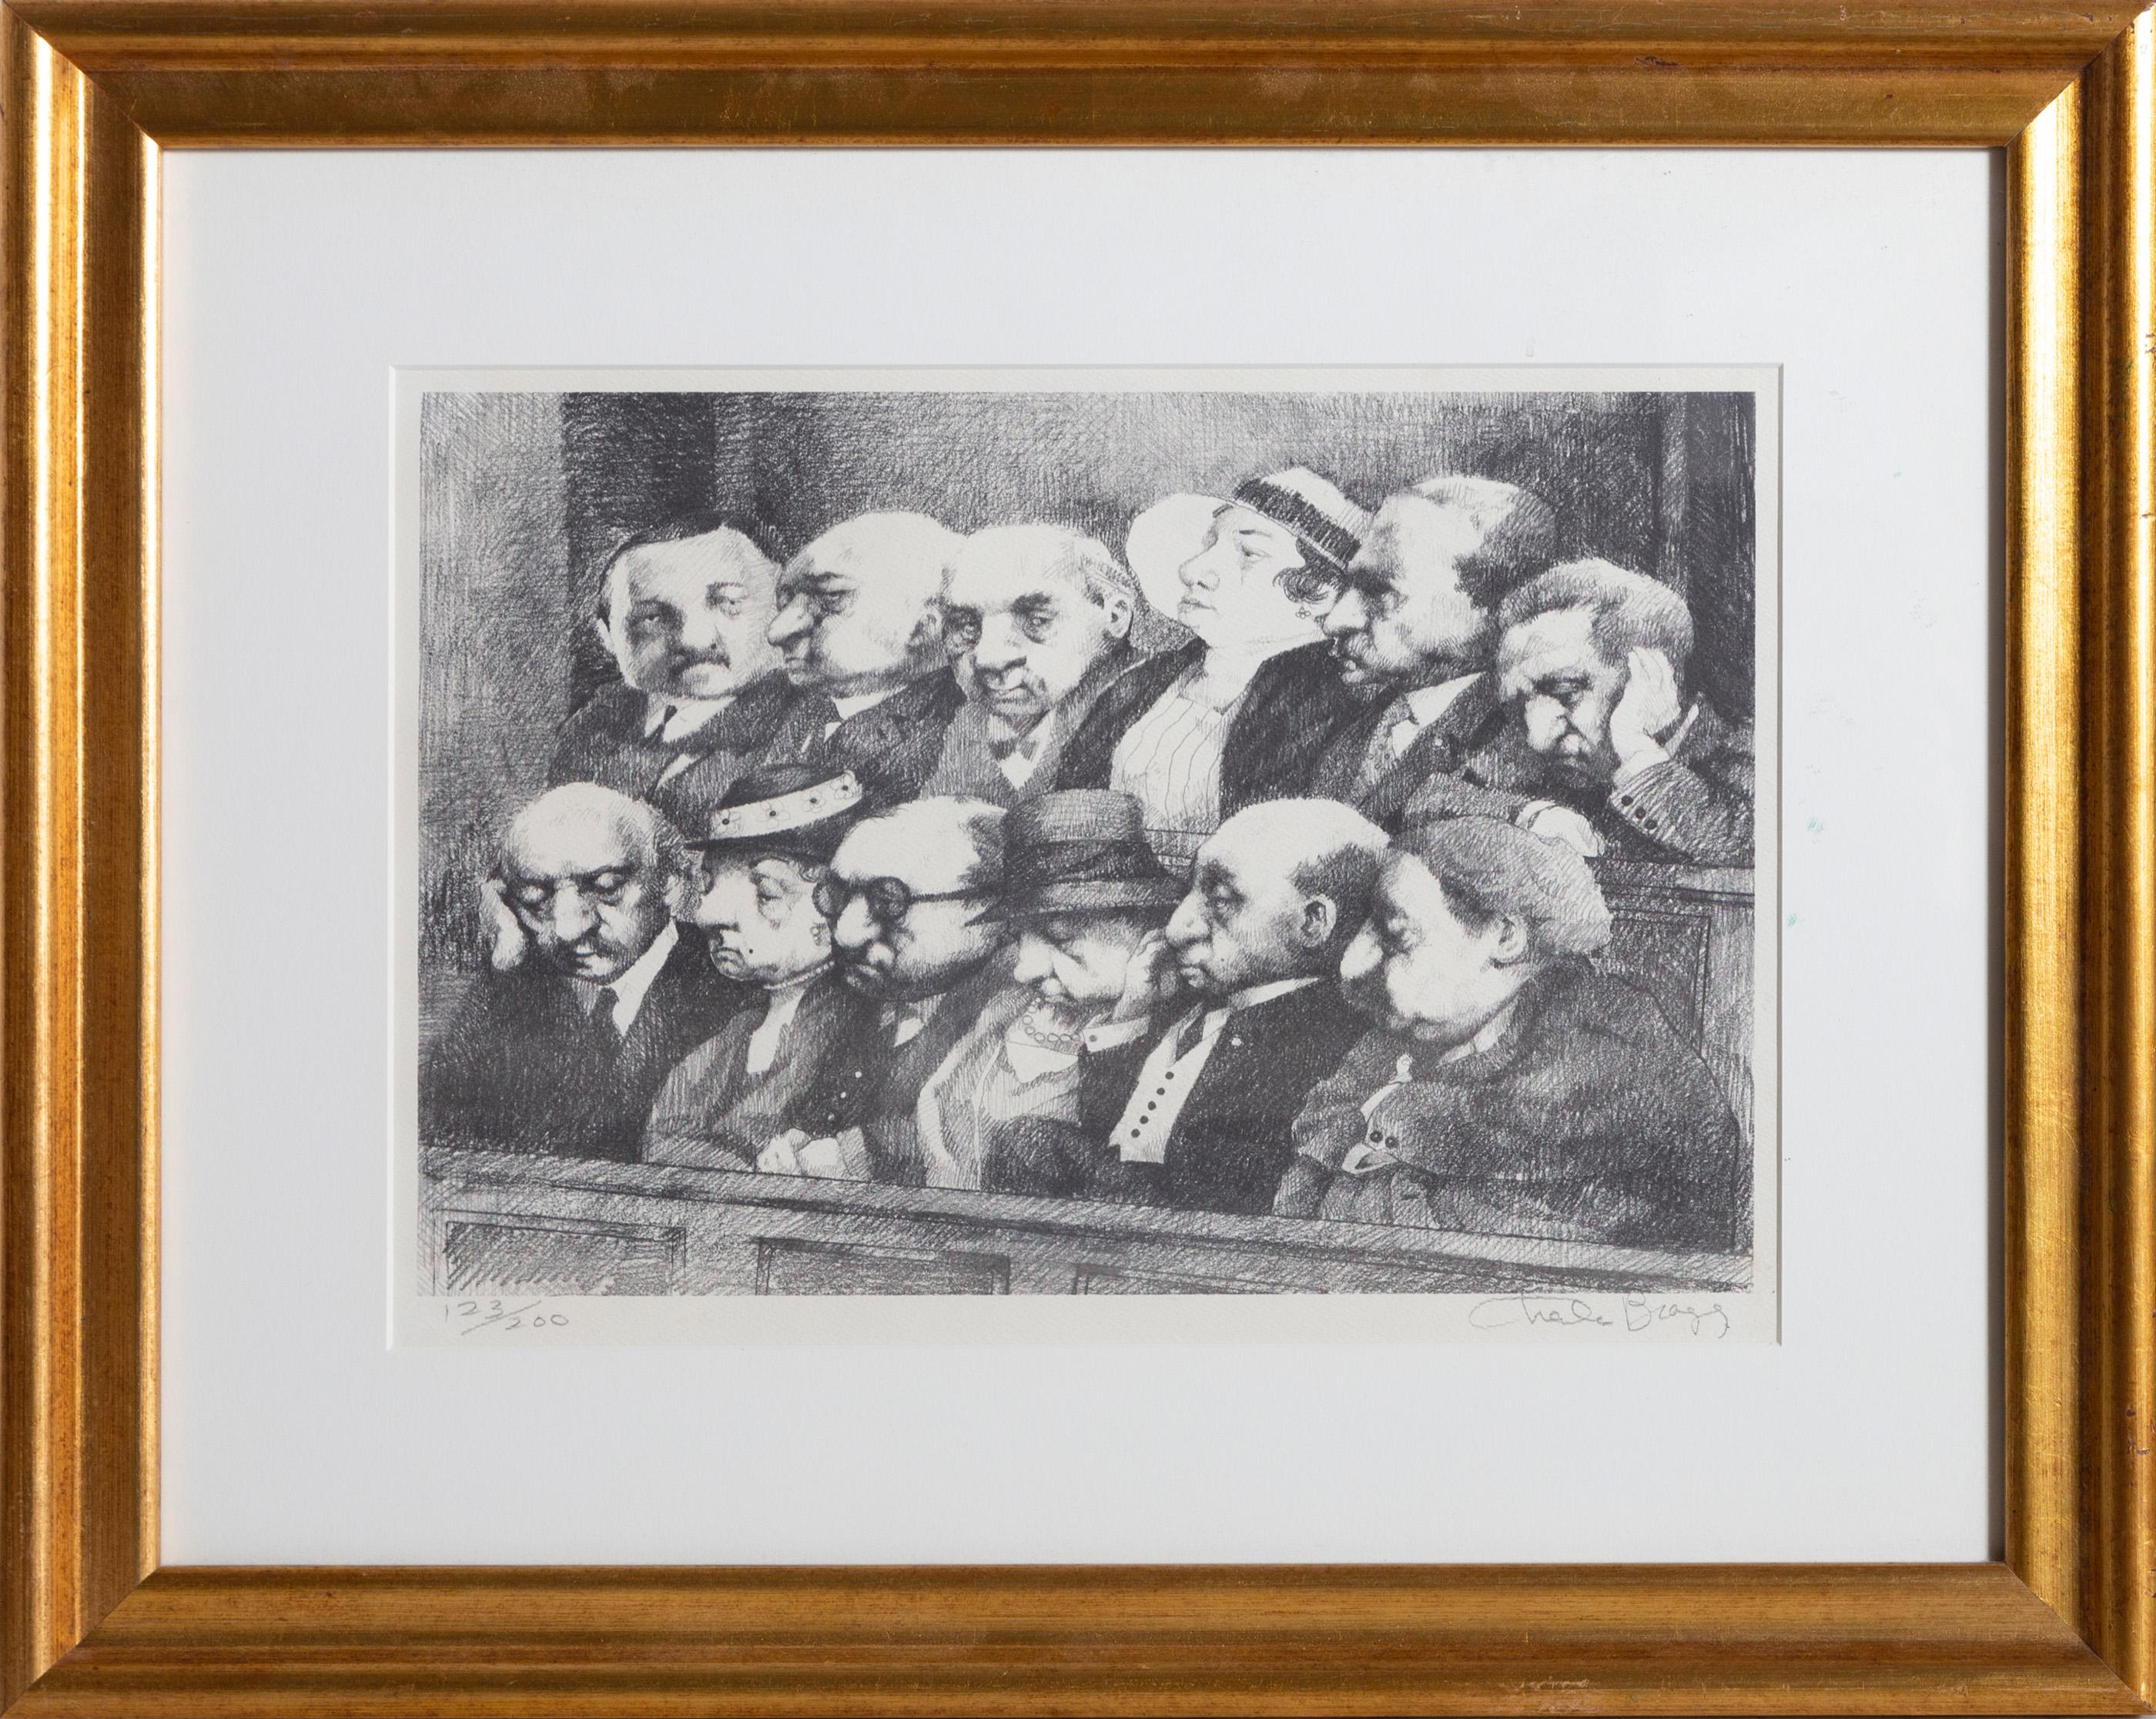 Charles Bragg, Jury, Lithograph